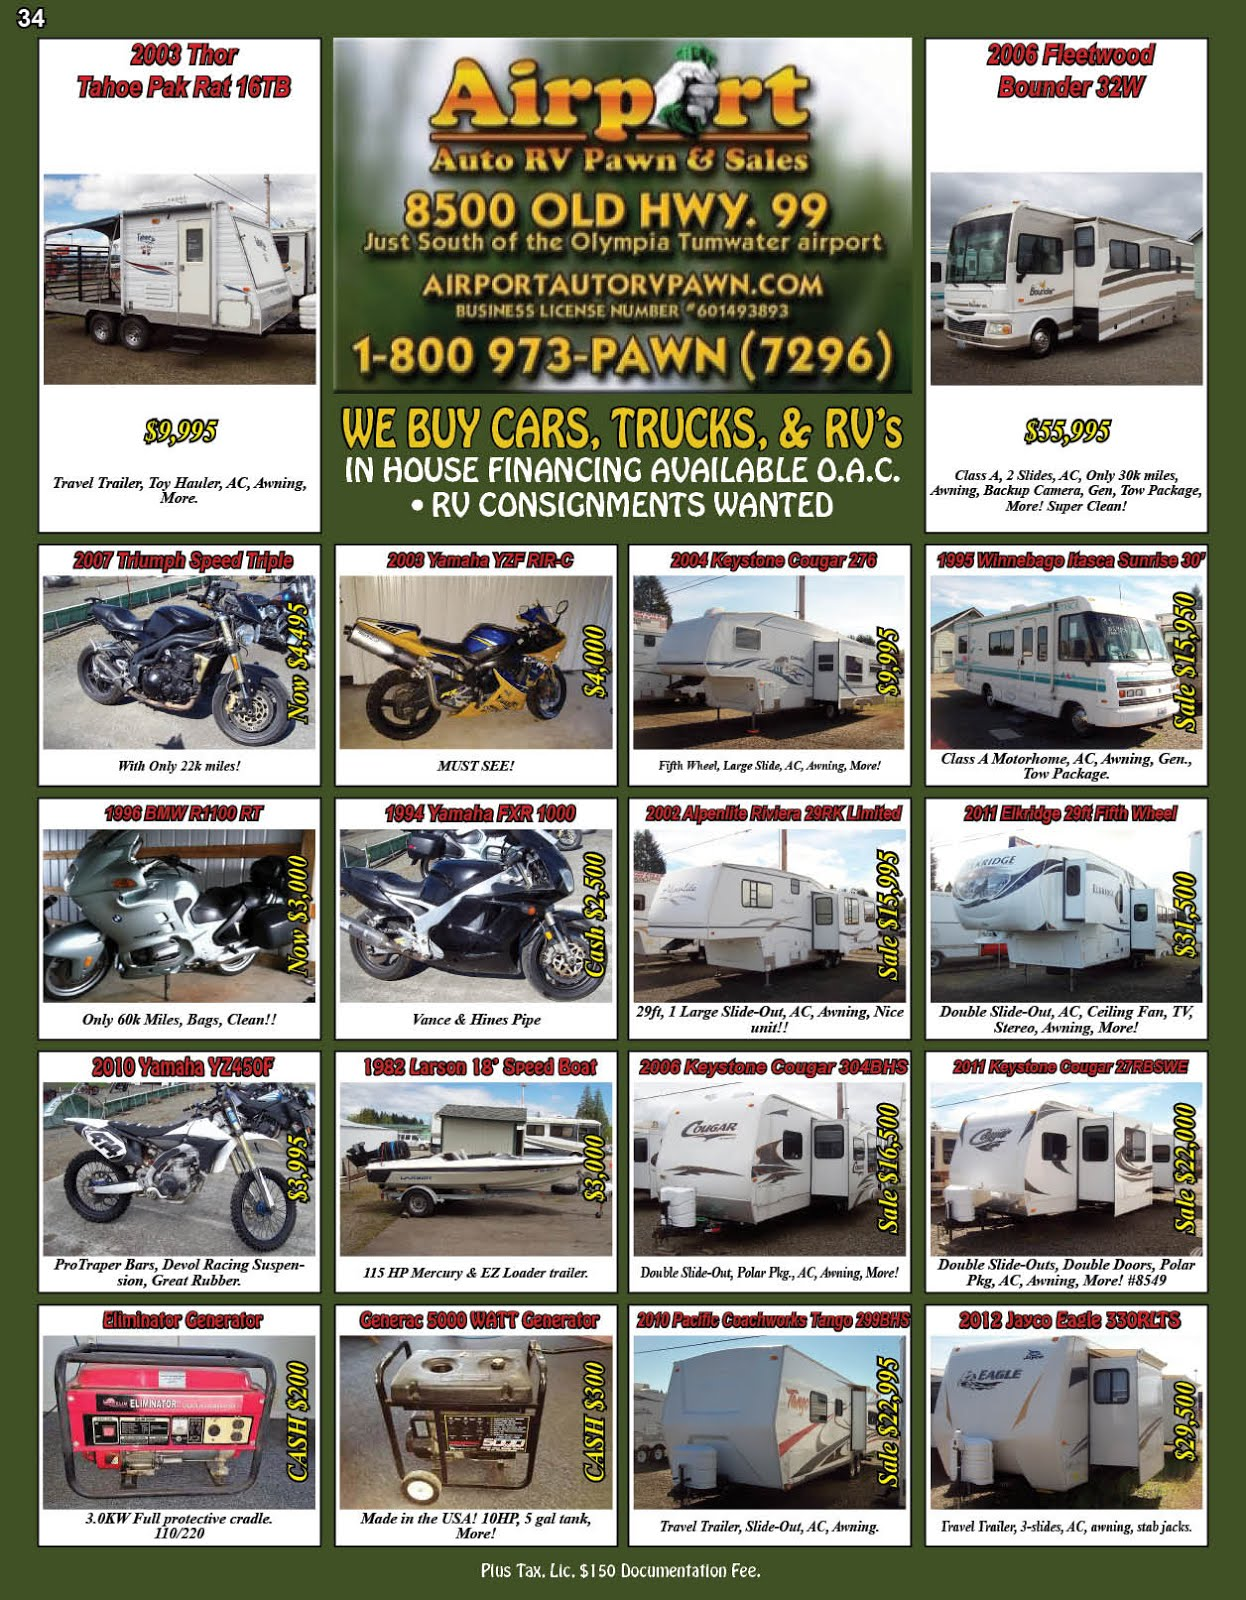 Airport Auto RV Pawn & Sales